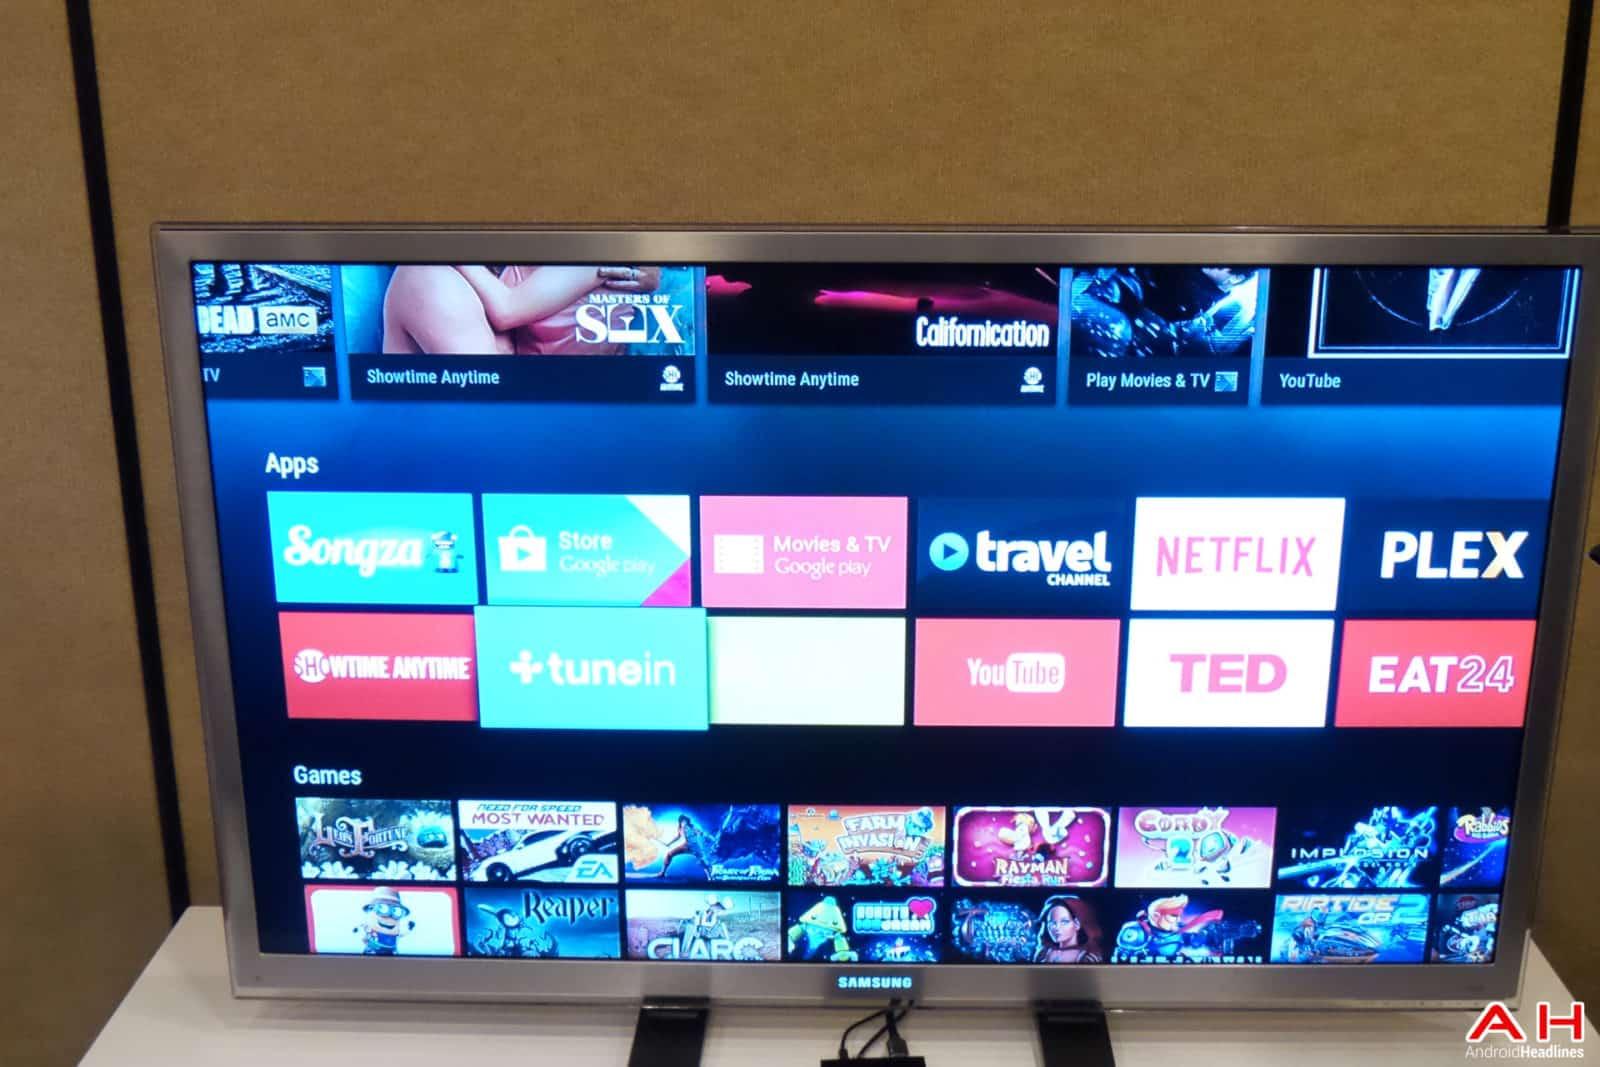 AH Google IO-1409 Android TV 2.1